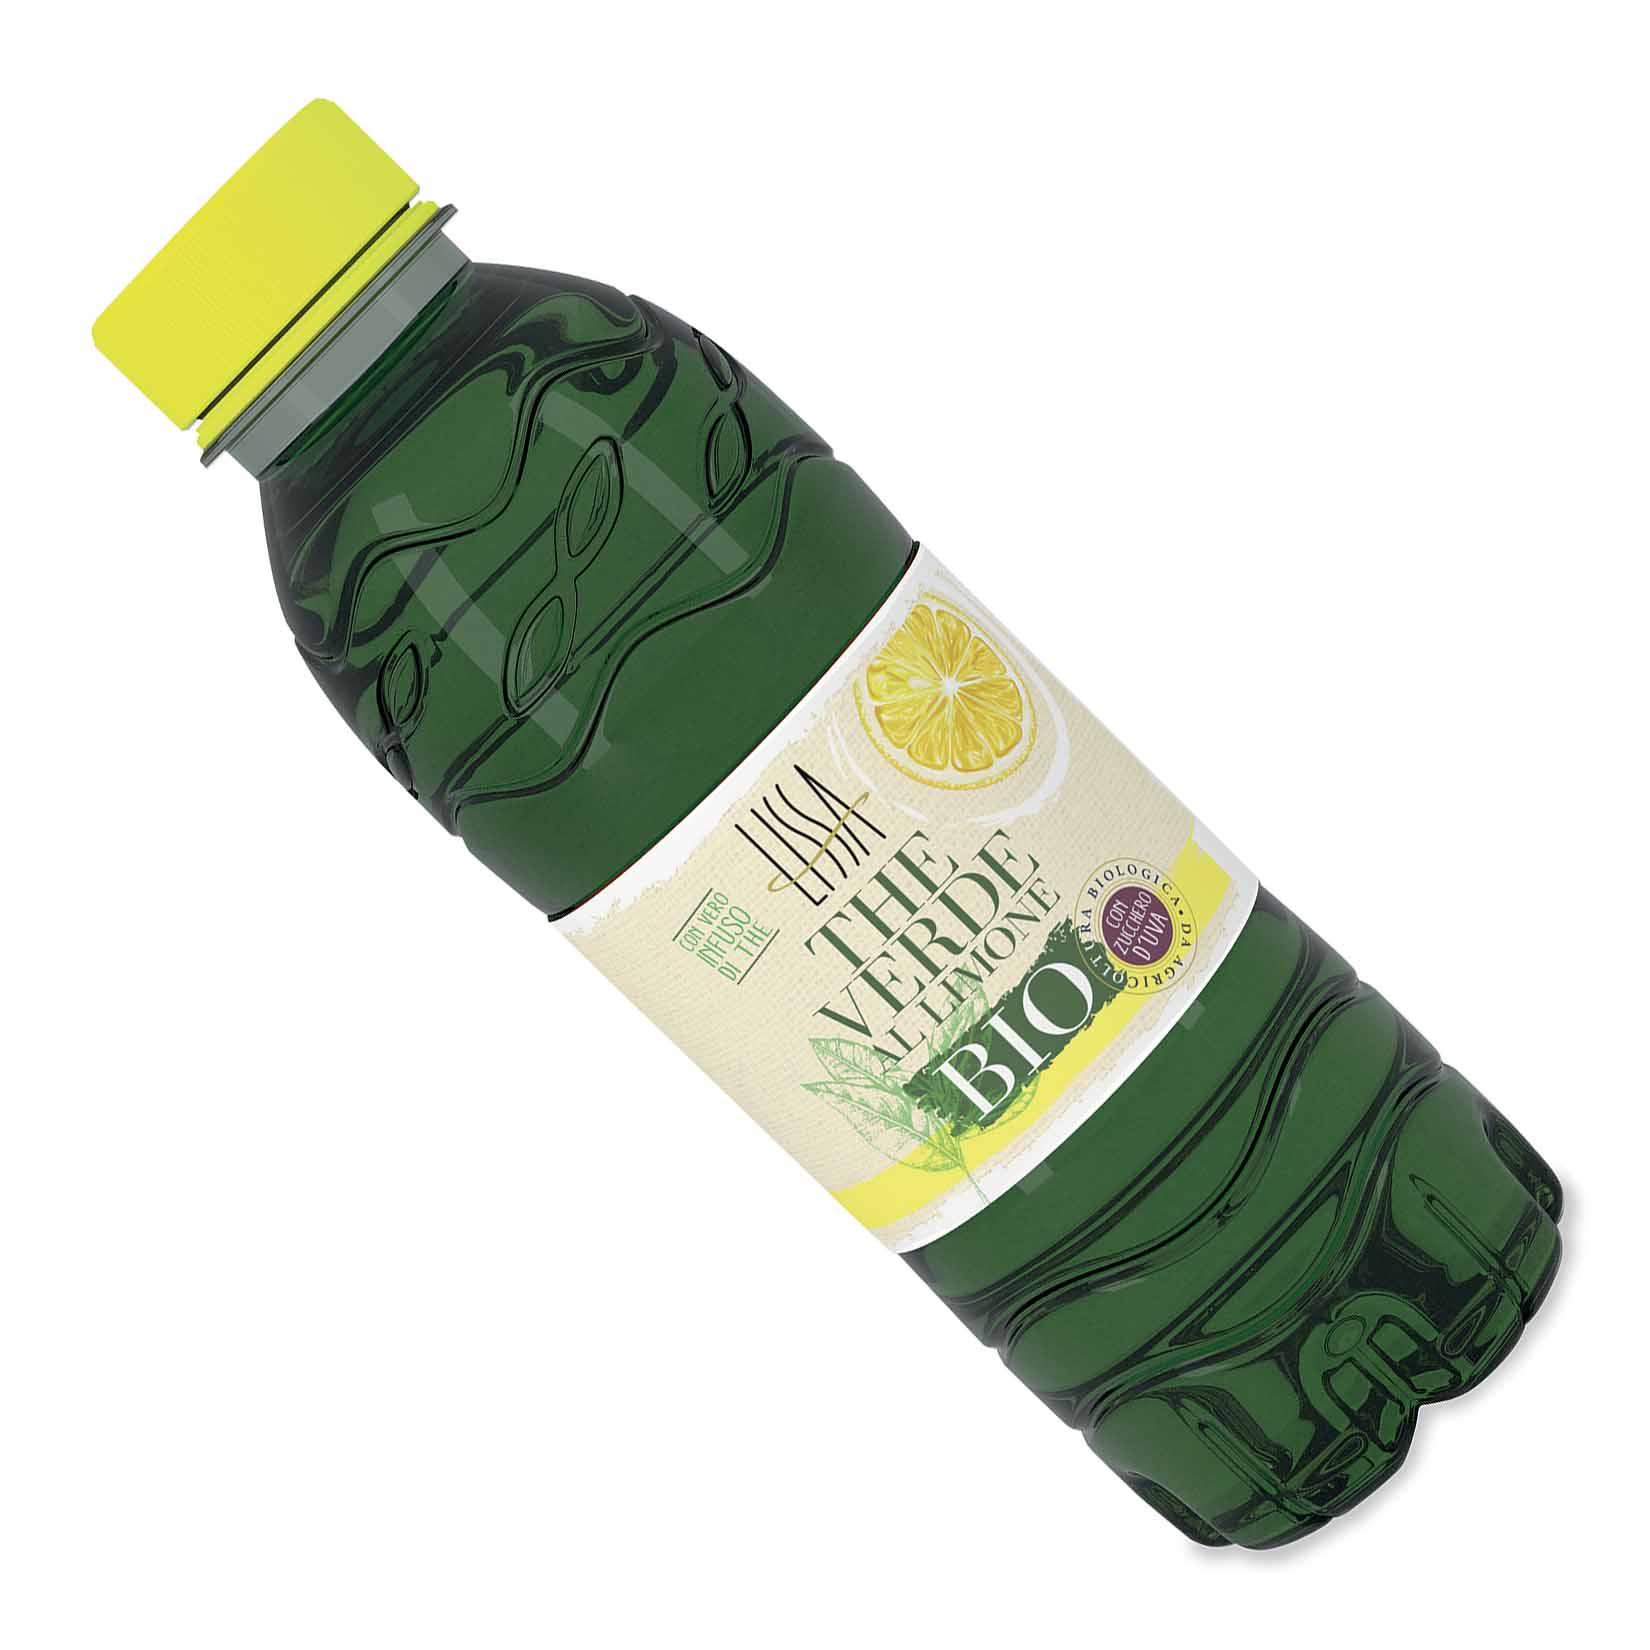 Lissa The verde al limone 500ml